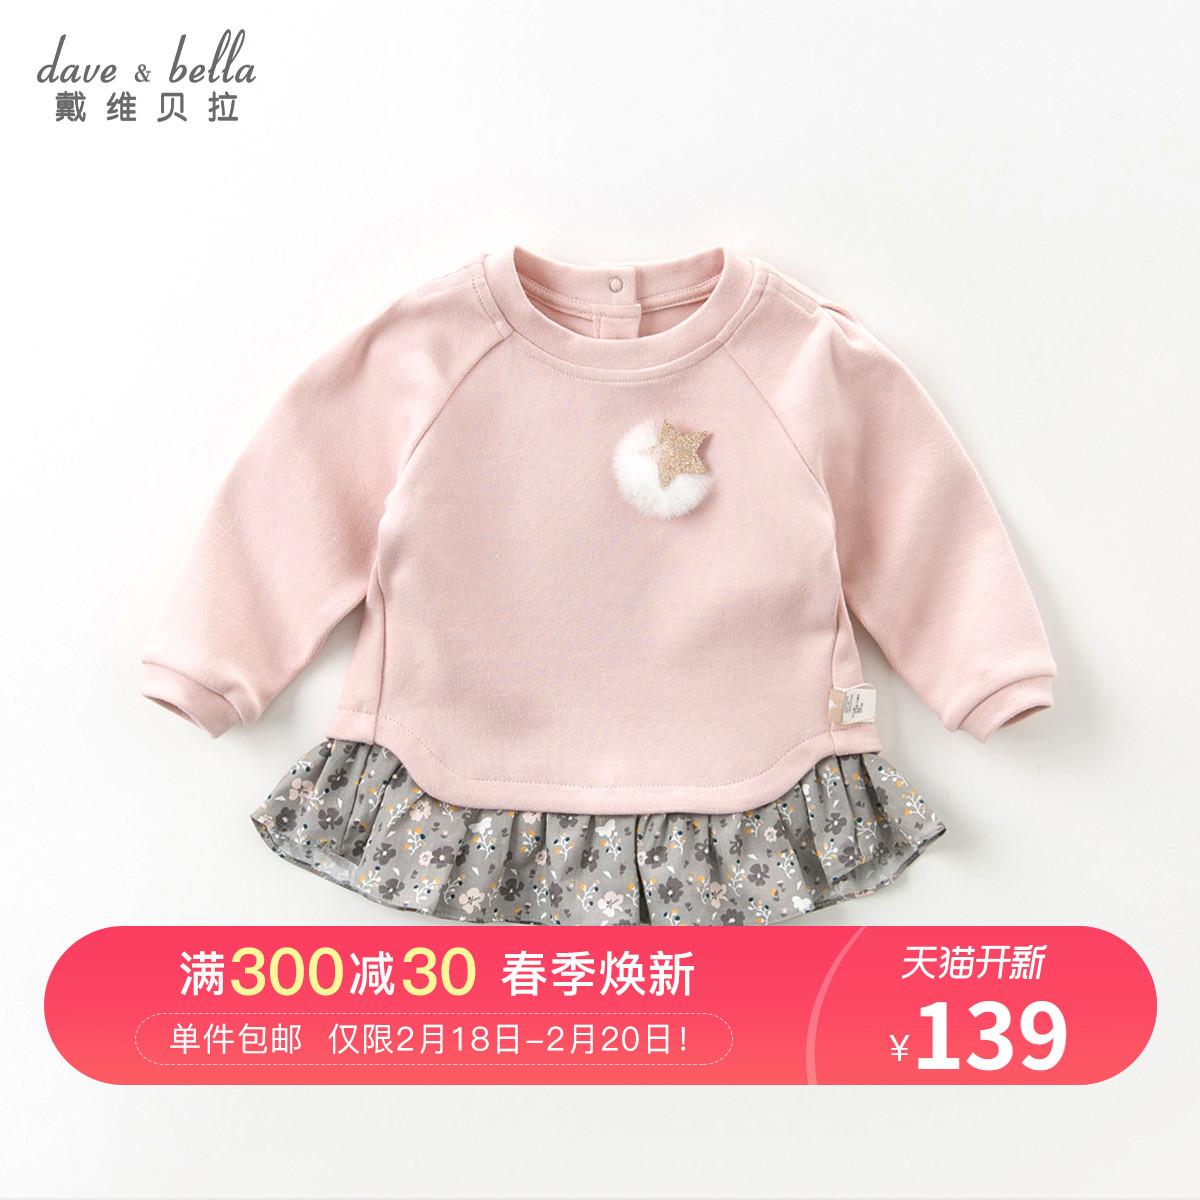 davebella戴维贝拉春季女童粉色套头T恤 宝宝拼接裙式上衣DB6206